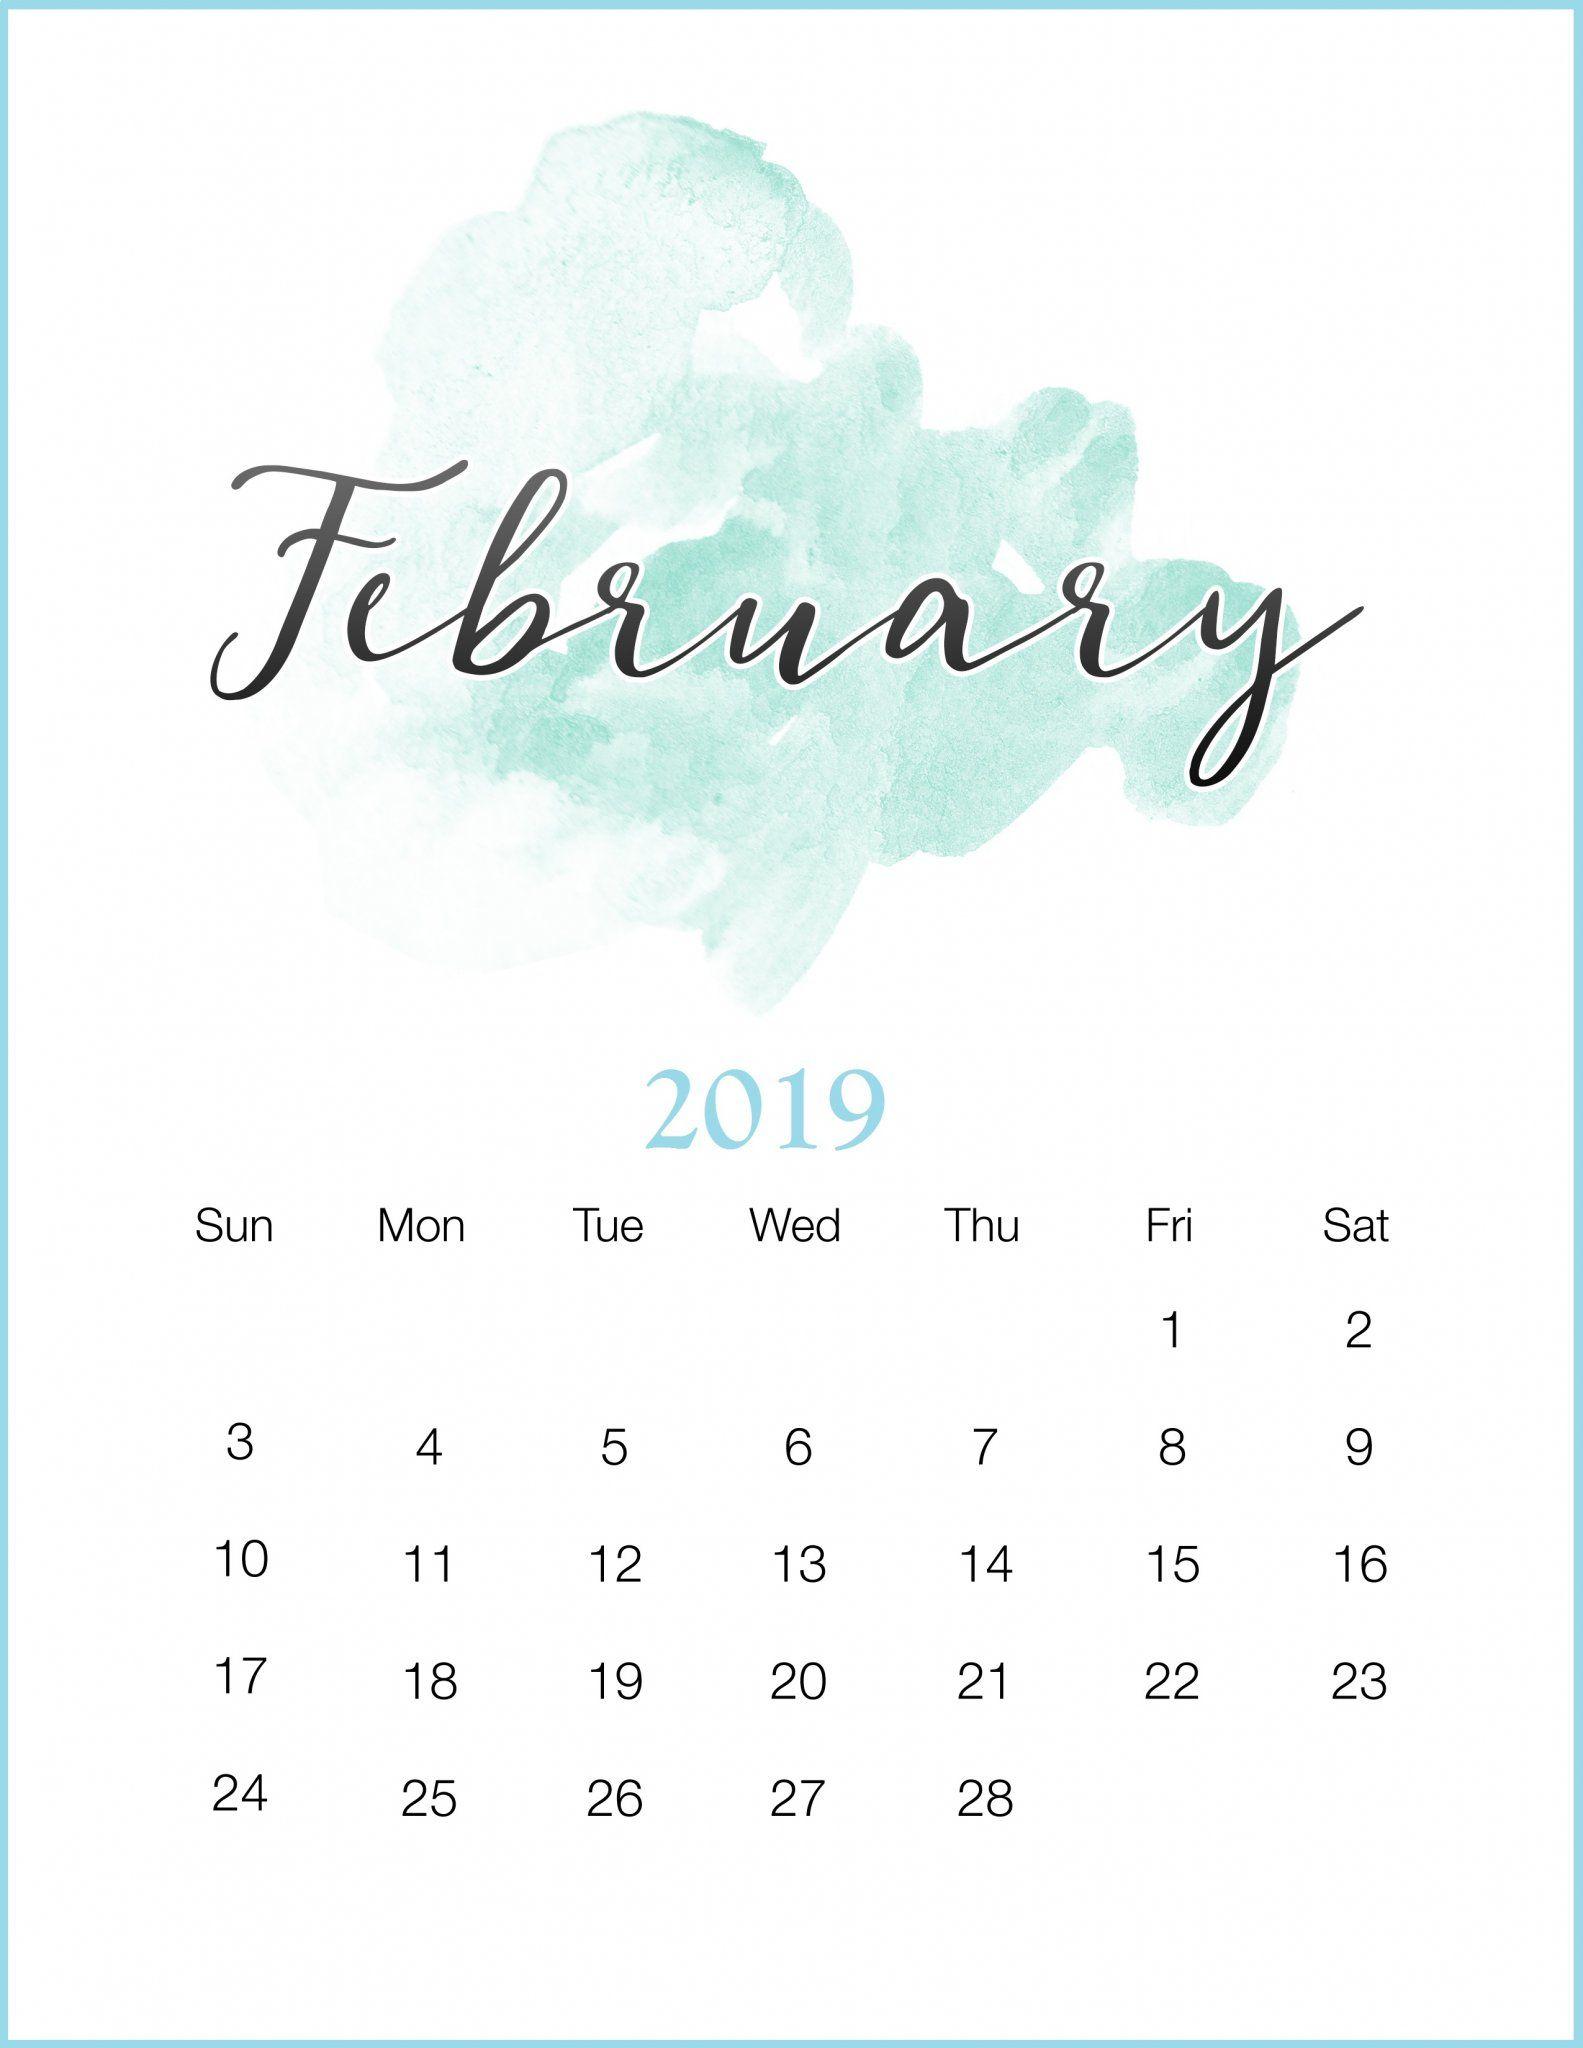 Calendar 2019 February Pinterest Watercolor 2019 February Printable Calendar | 250+ 2019 Calendars